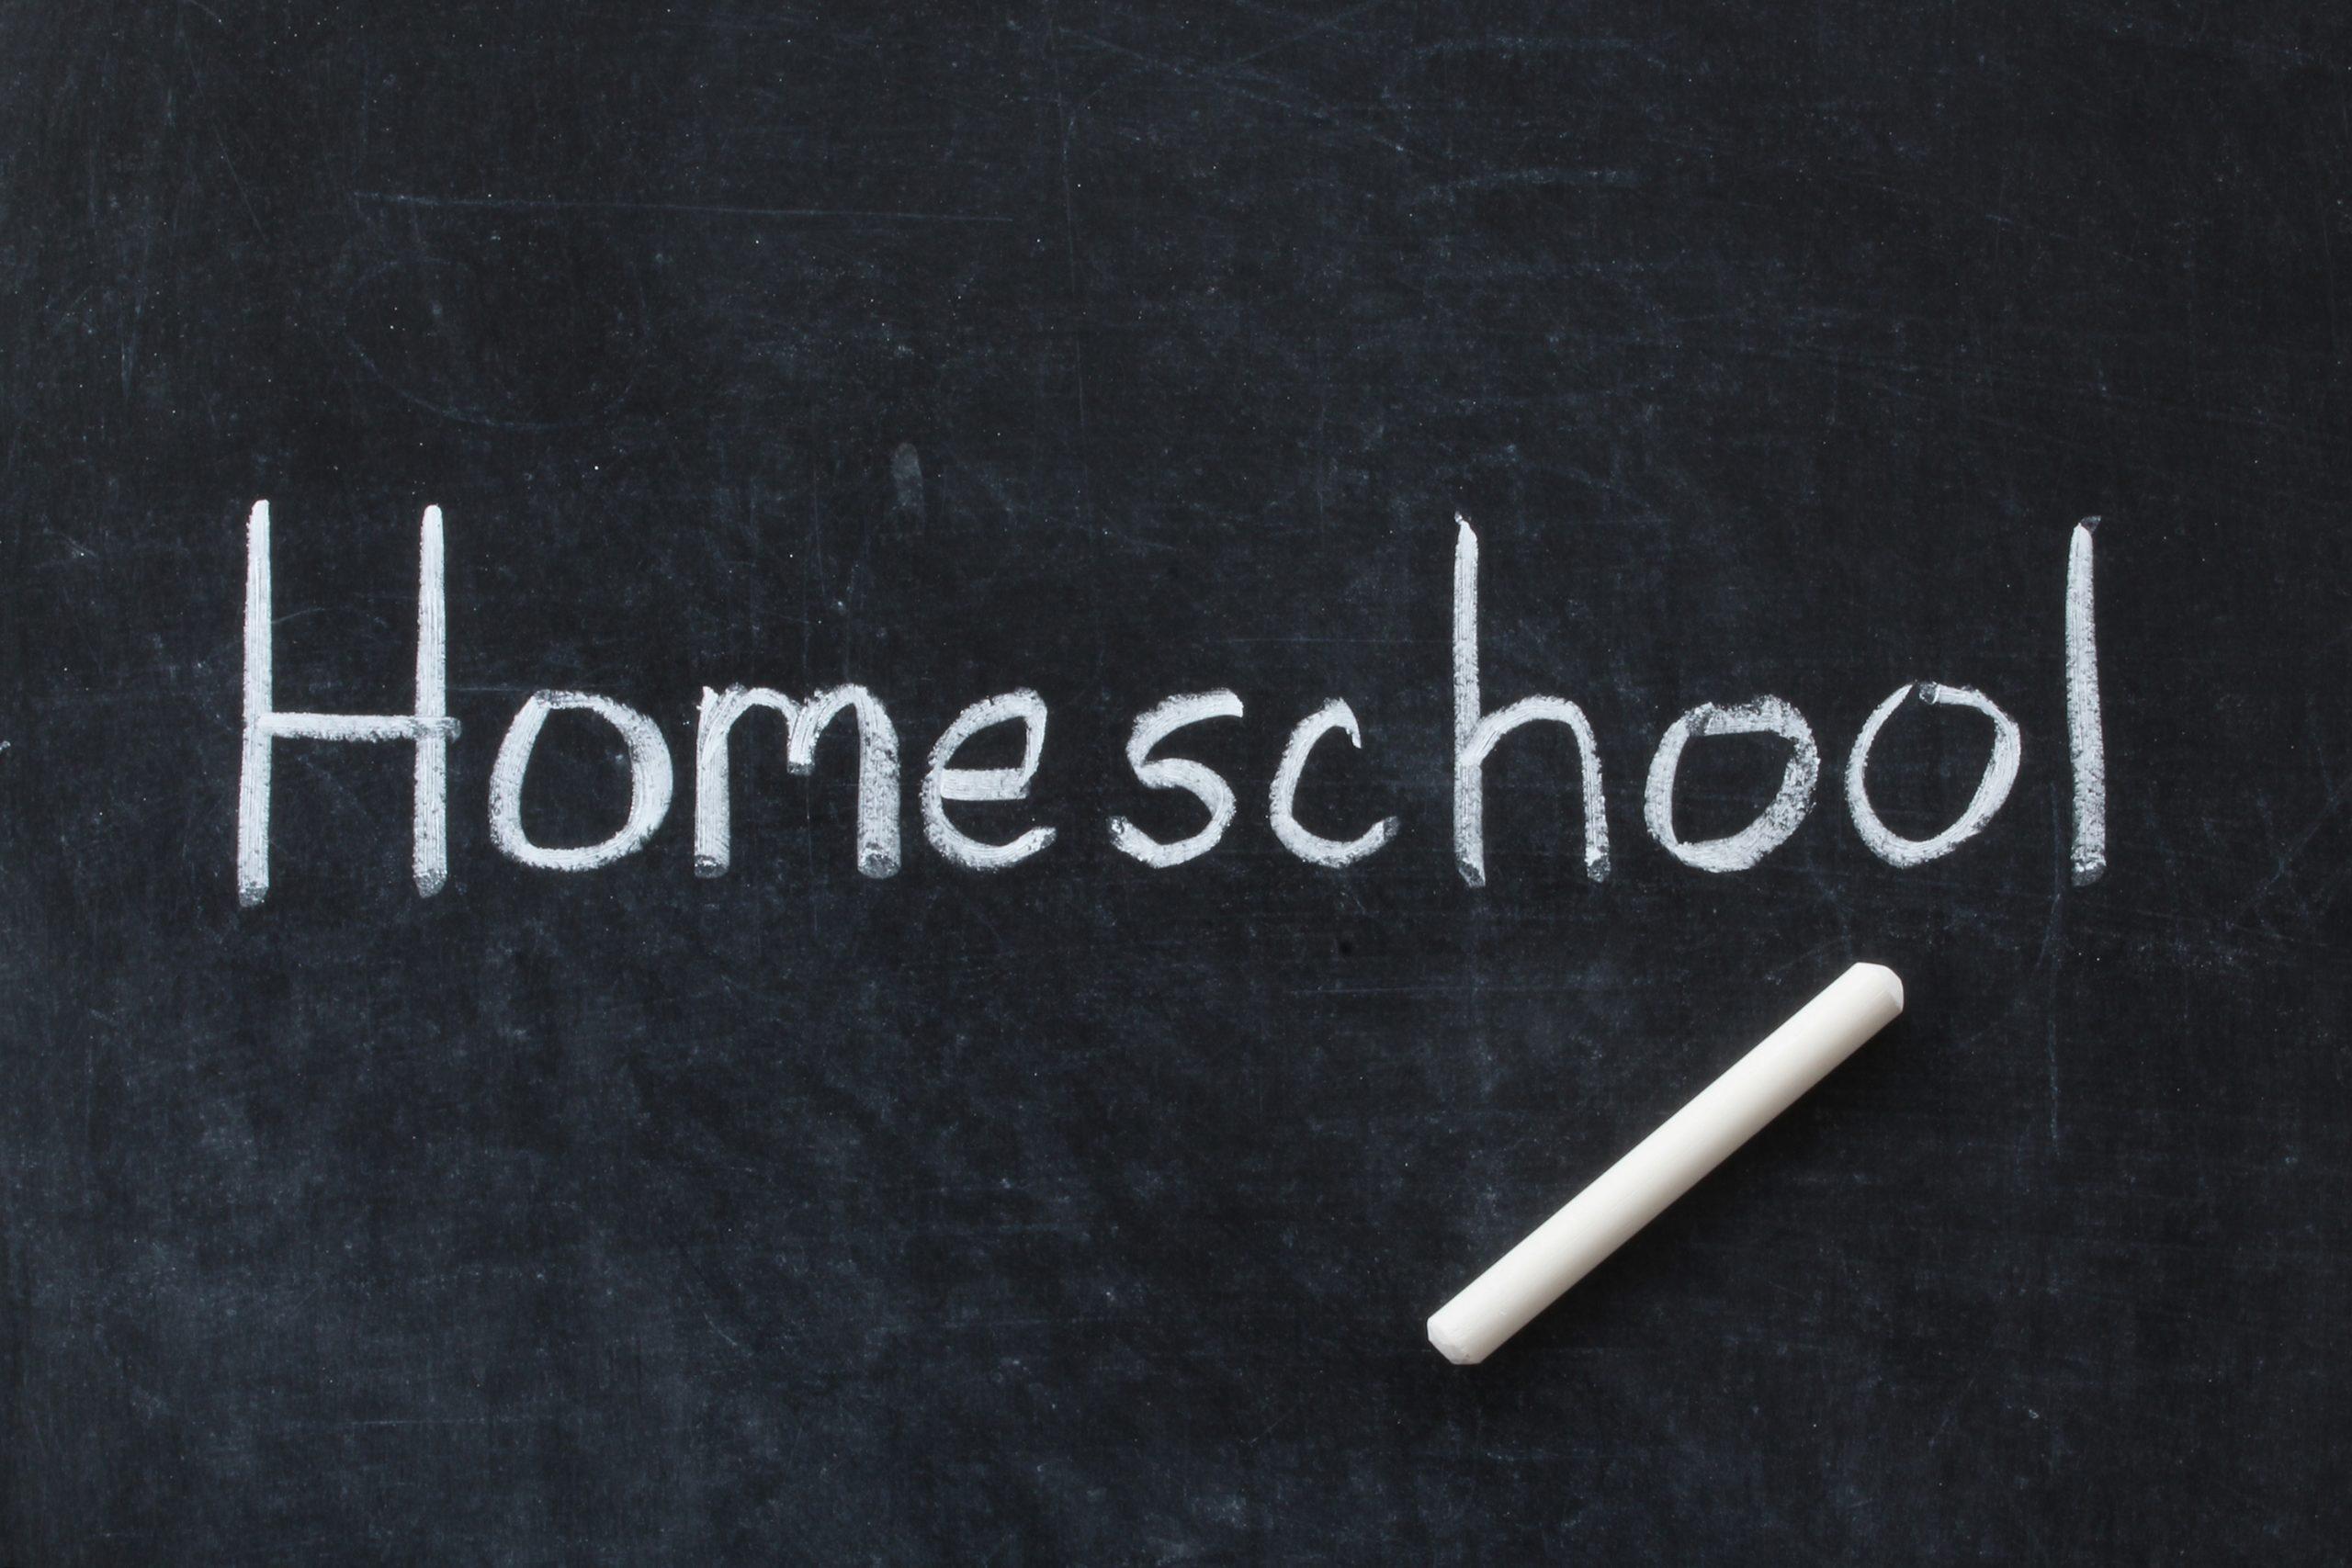 homeschool distance learning